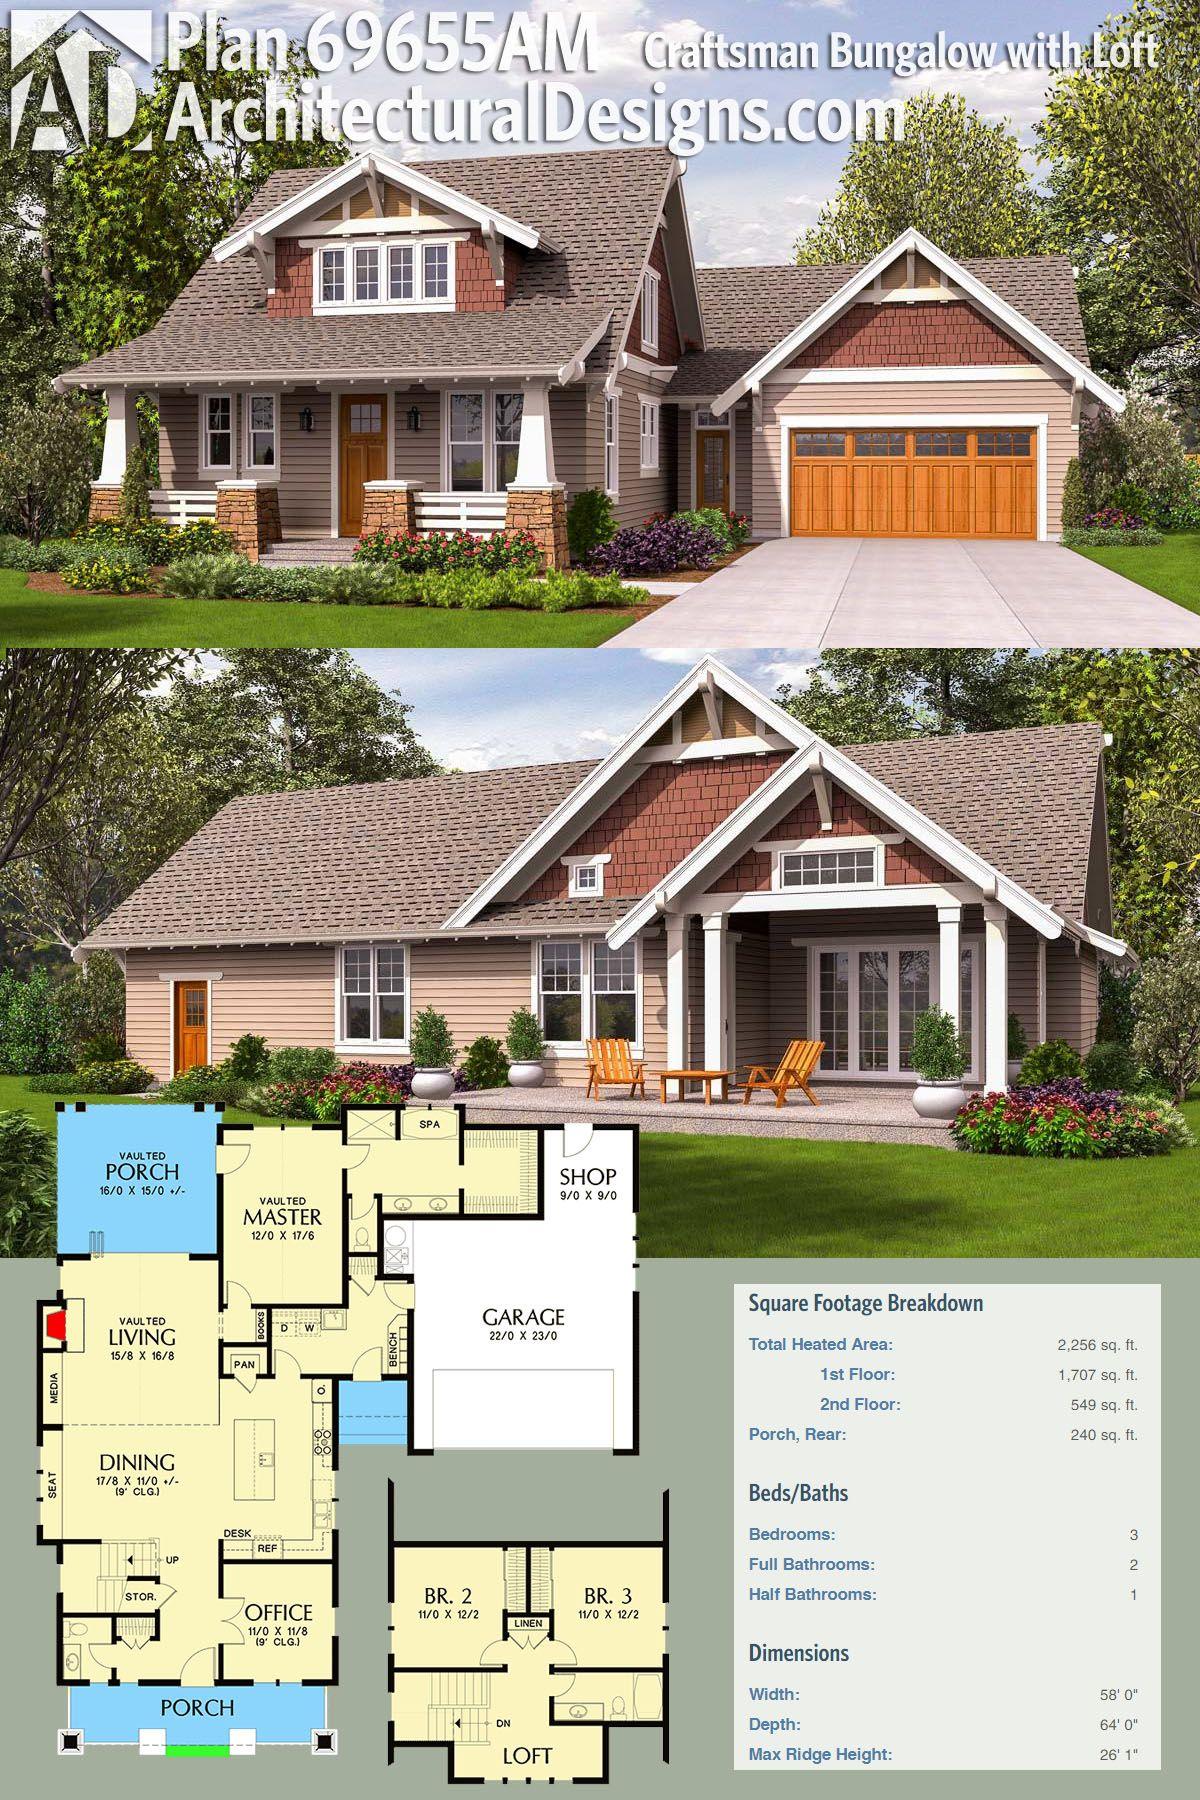 House Architectural Designs Plan 69655AM